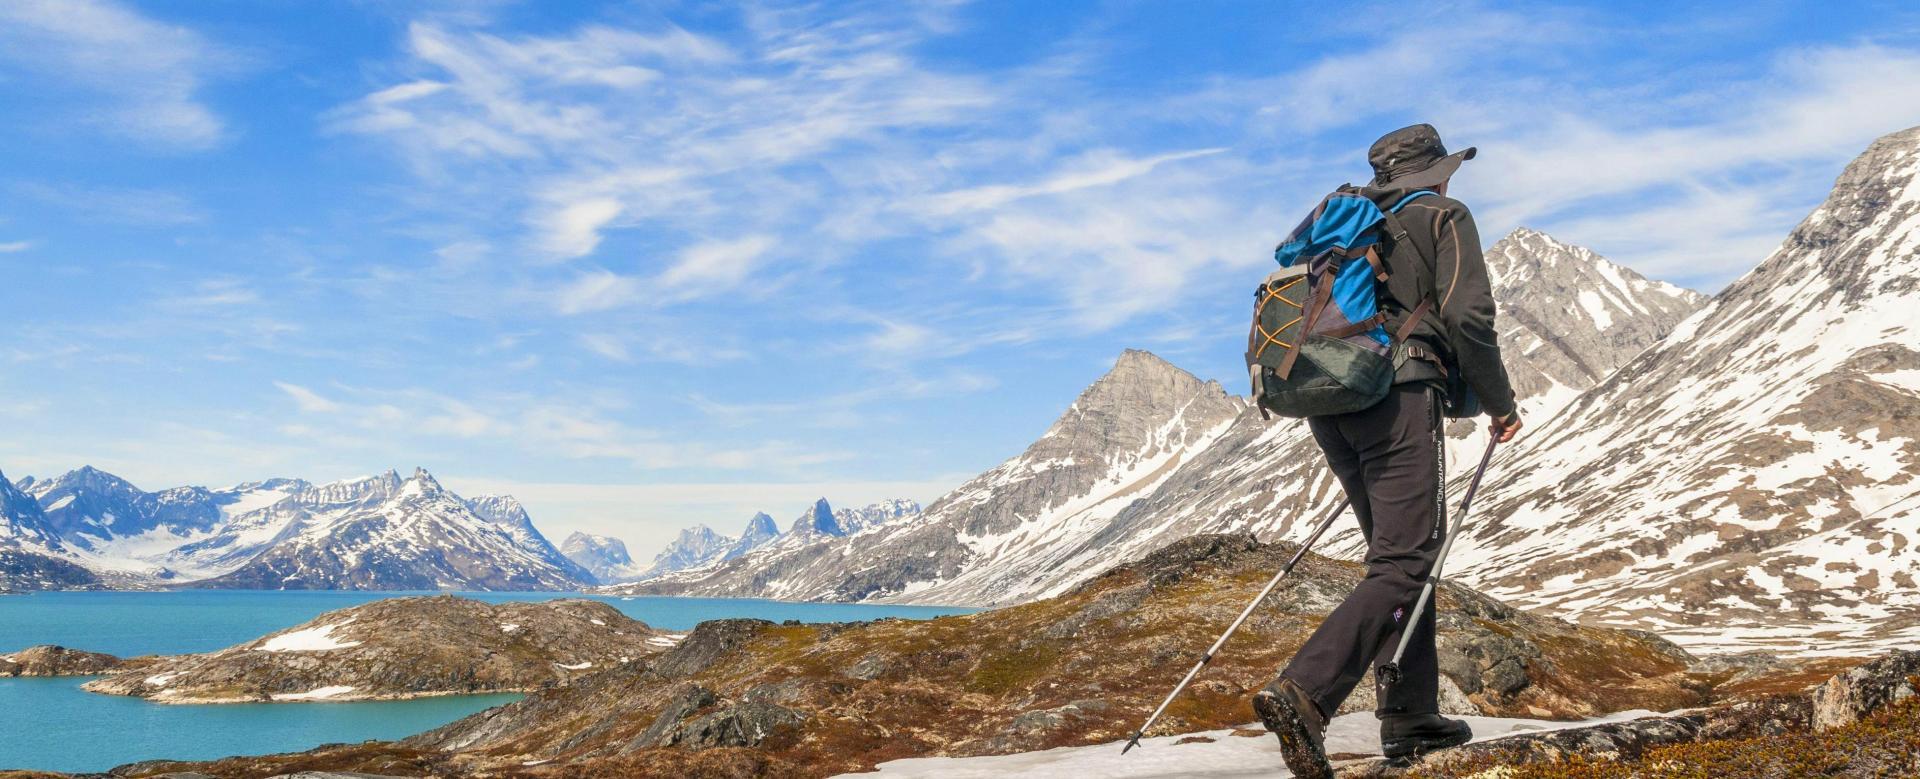 Trekking Groenland : Terre polaire